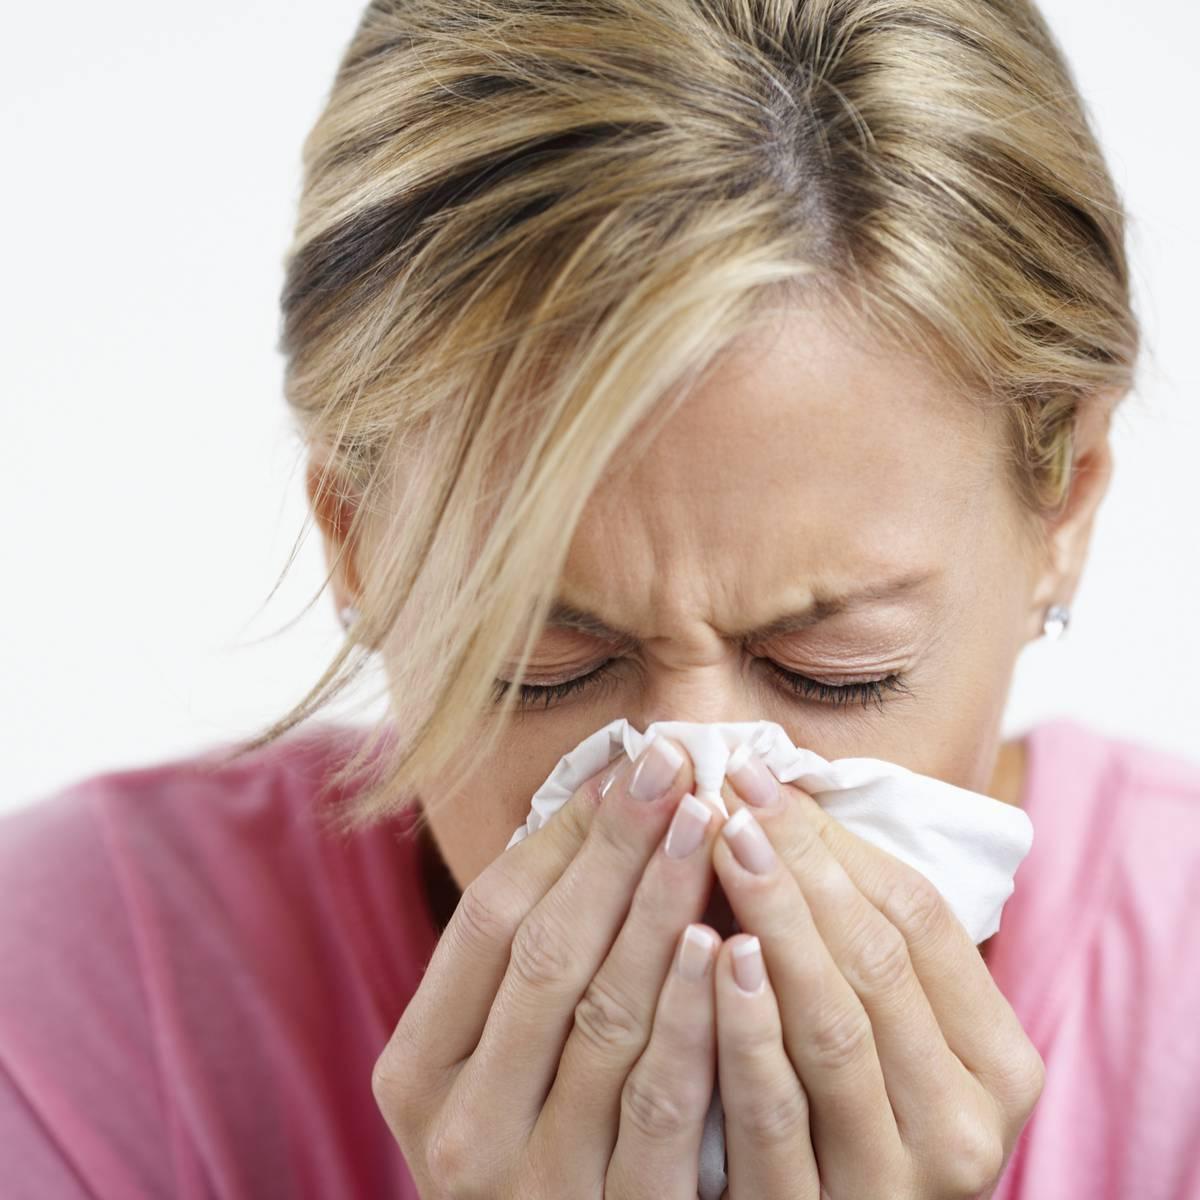 Трахеит | симптомы | диагностика | лечение - docdoc.ru